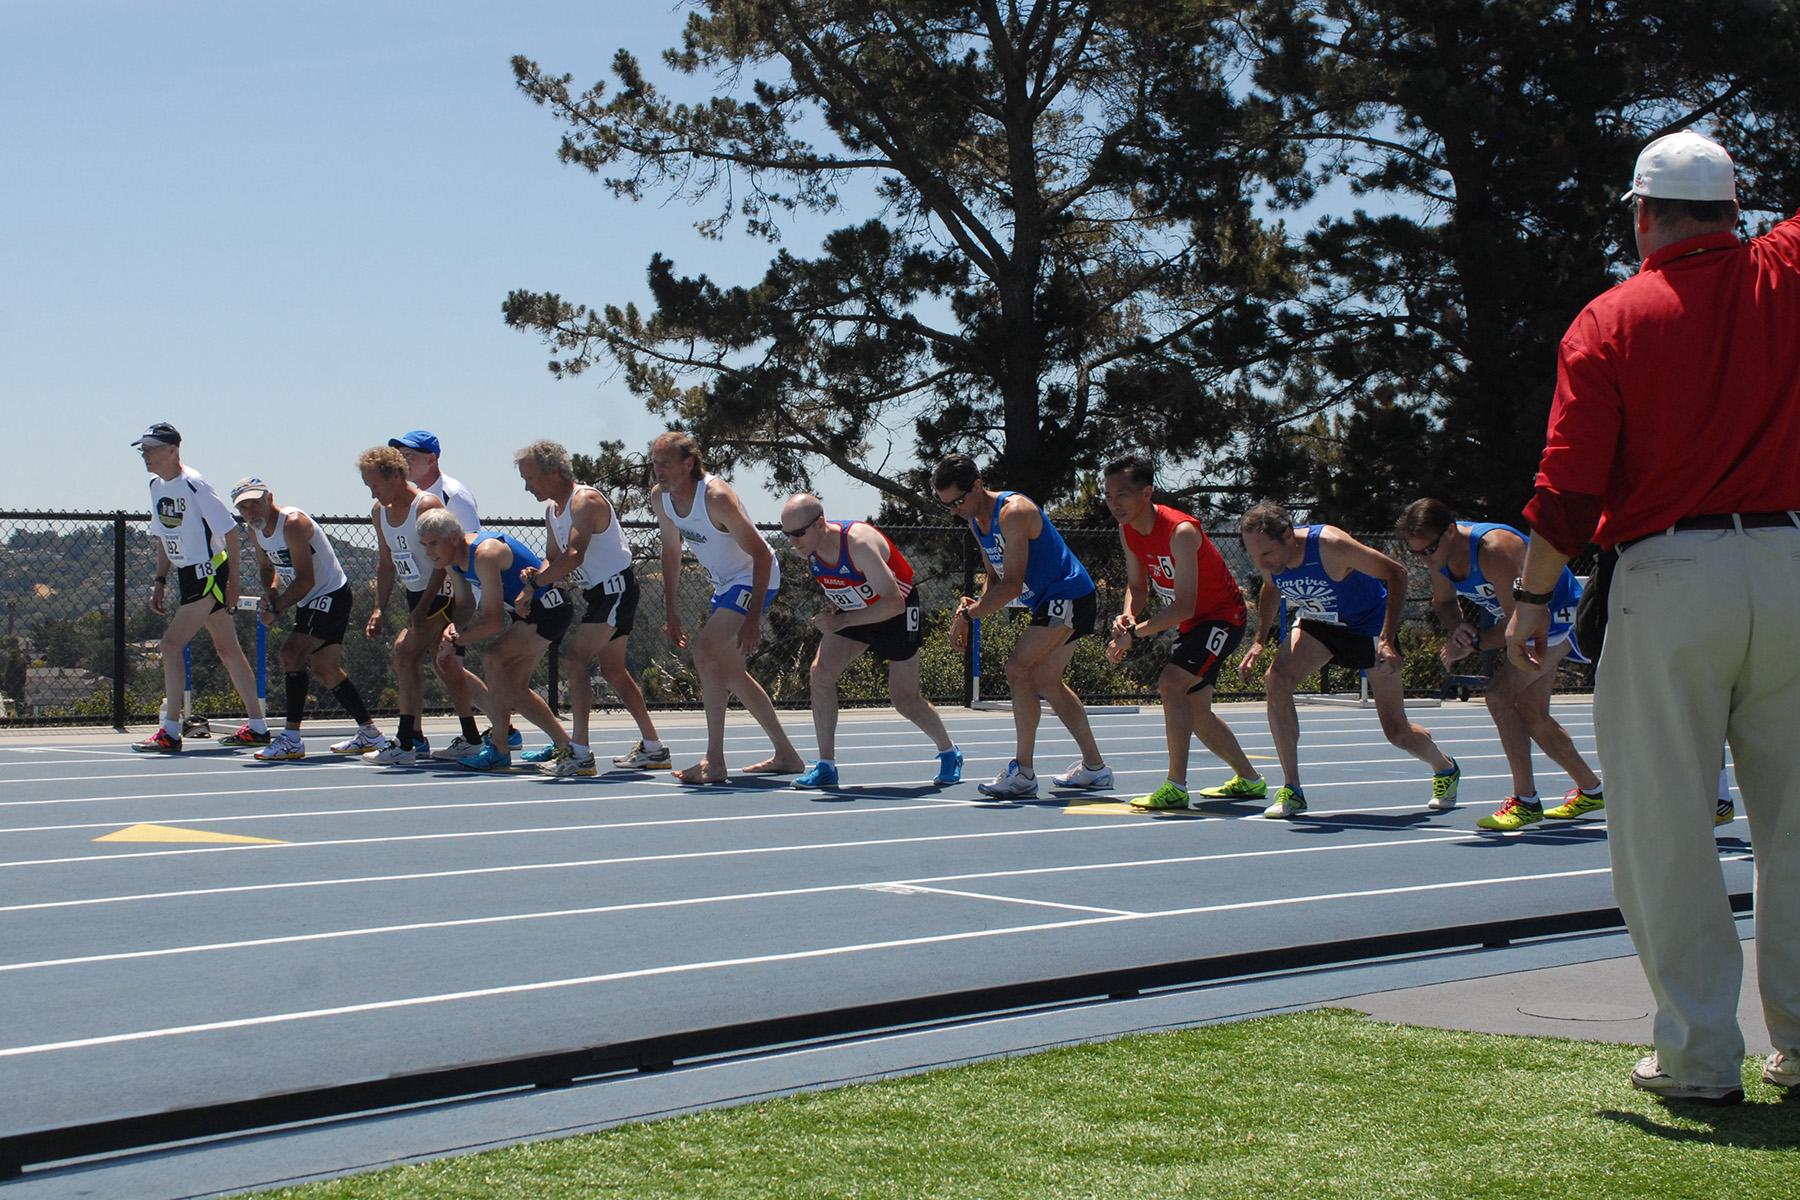 PAUSATF_Masters_Championships_2014_1500m_Mens-Start.jpg